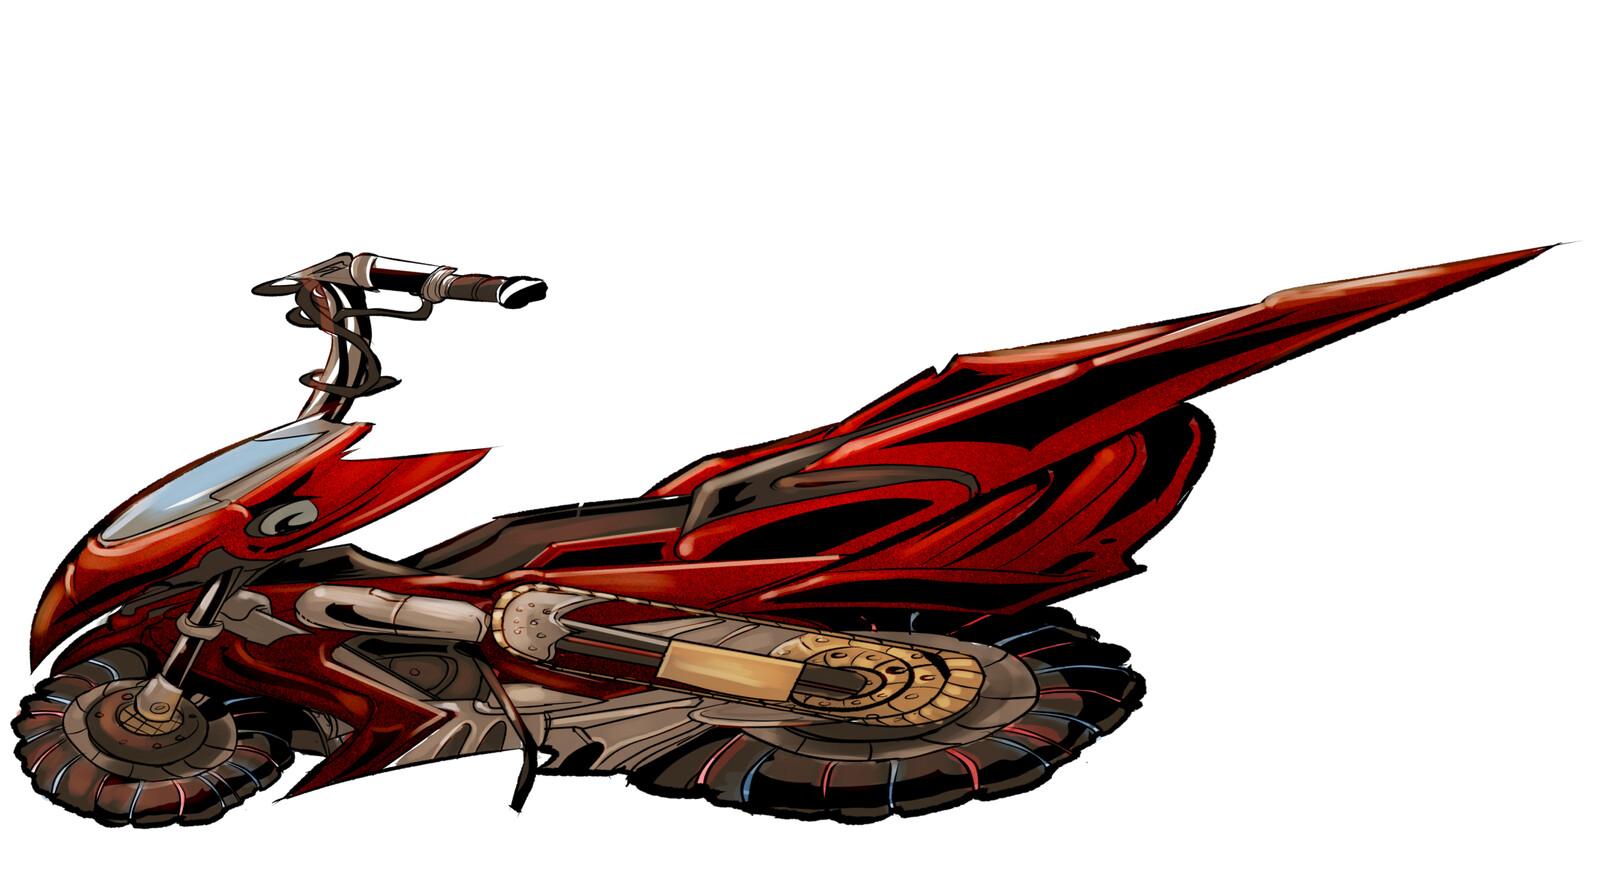 Just the Bike.